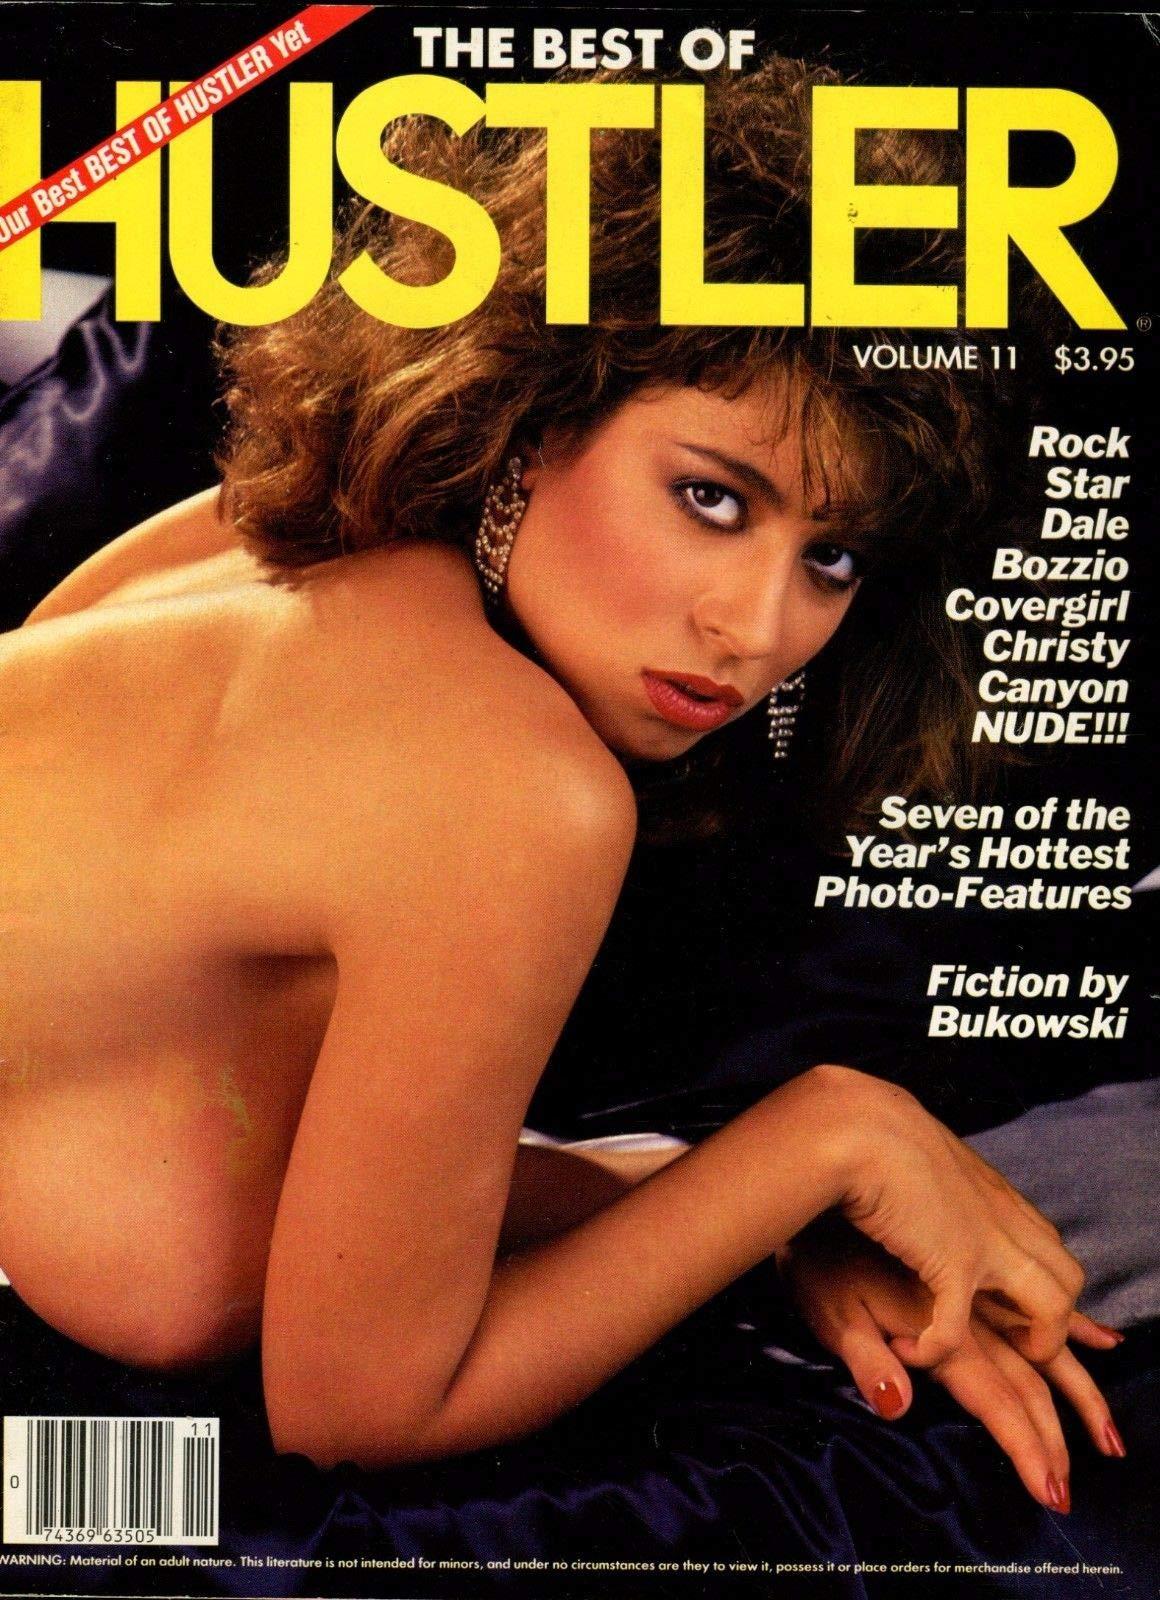 The Best of Hustler Adult Magazine:Volume 11 Paperback – 1985